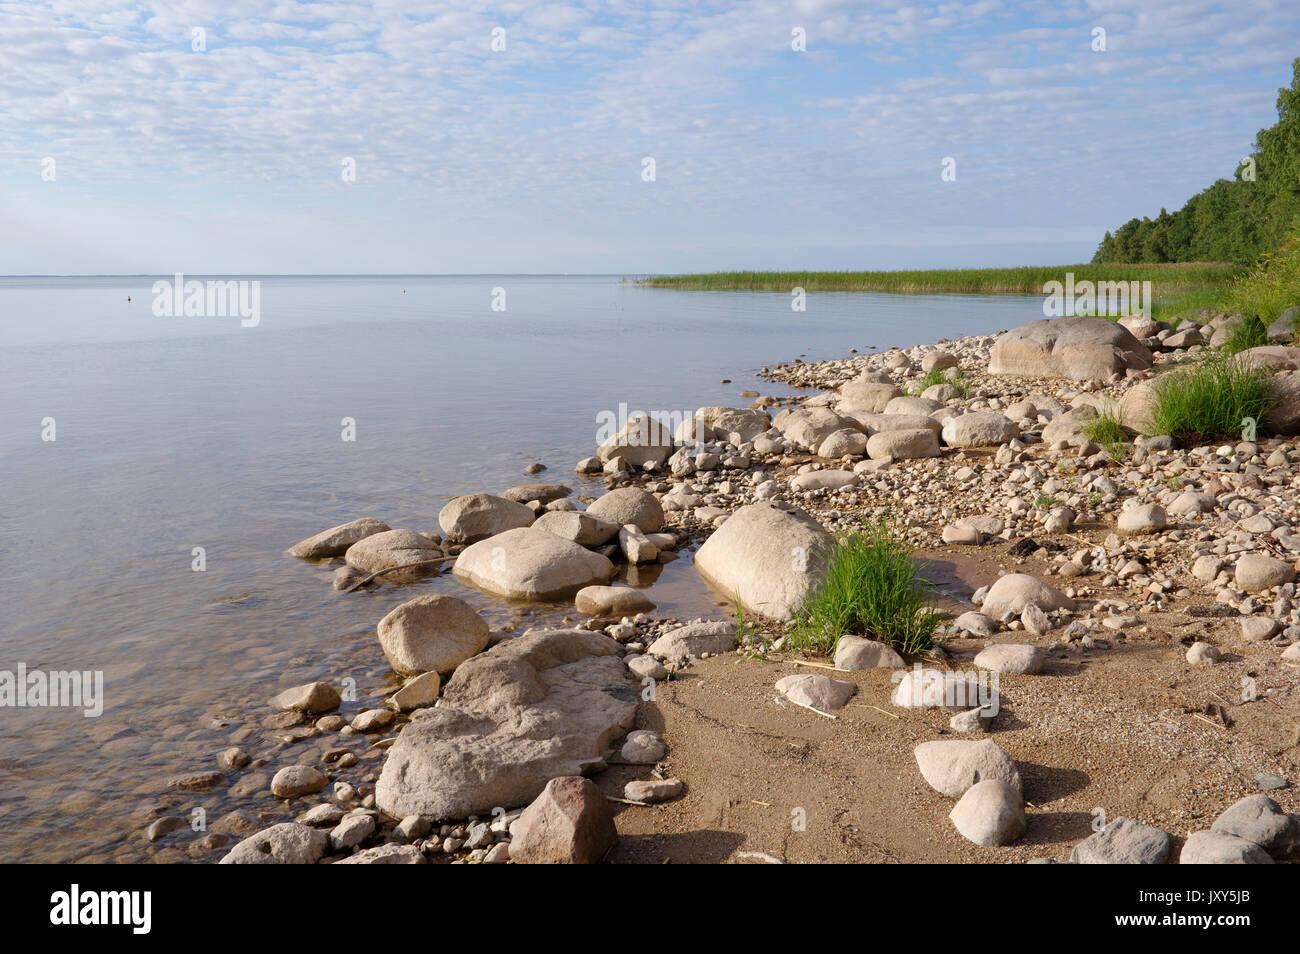 View to the Lake Võrtsjärv, Estonia 16.08.2017 Stock Photo